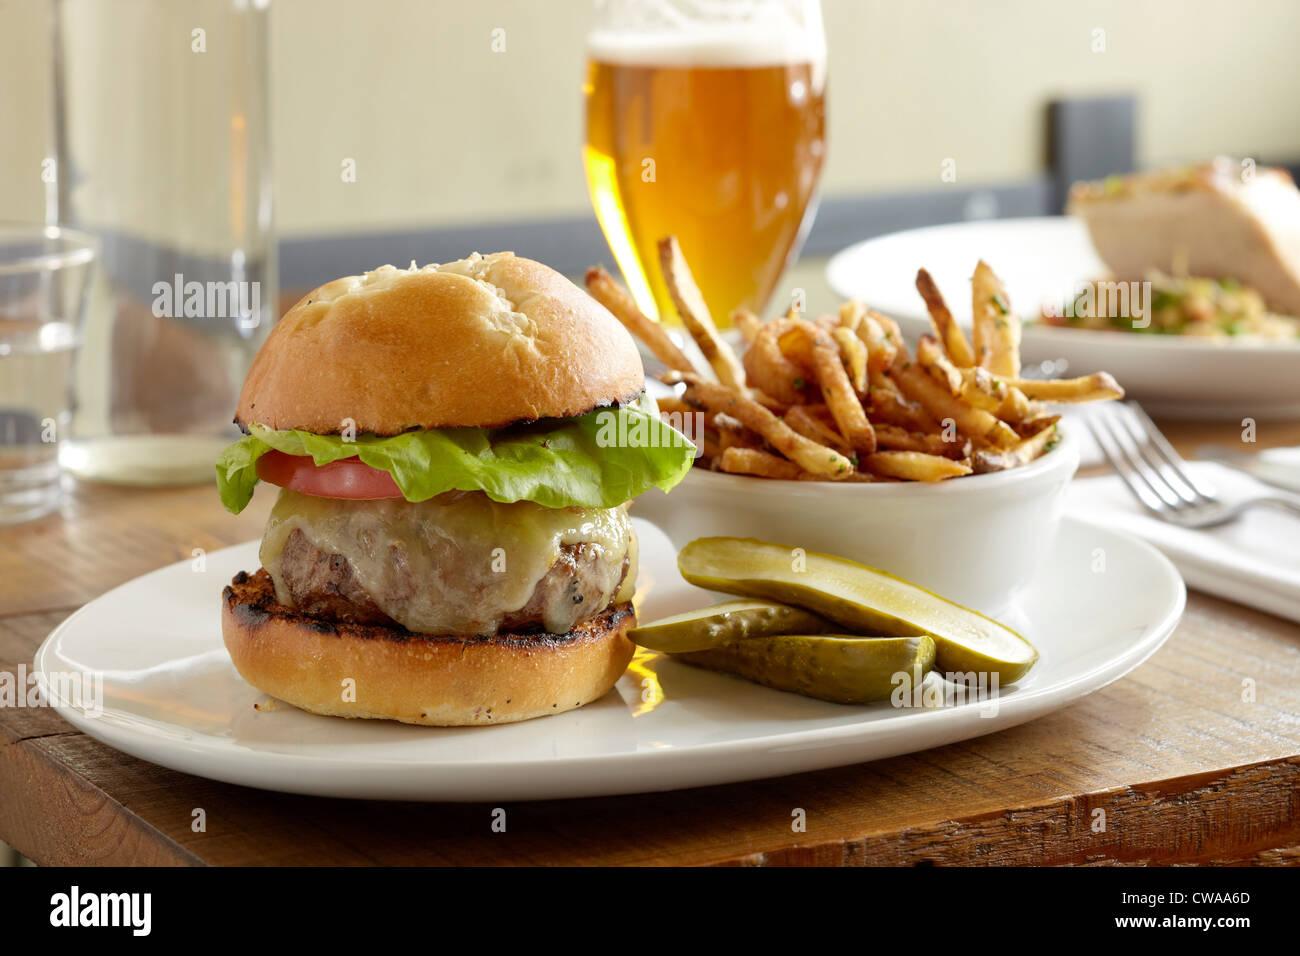 Hamburger e patatine fritte Immagini Stock